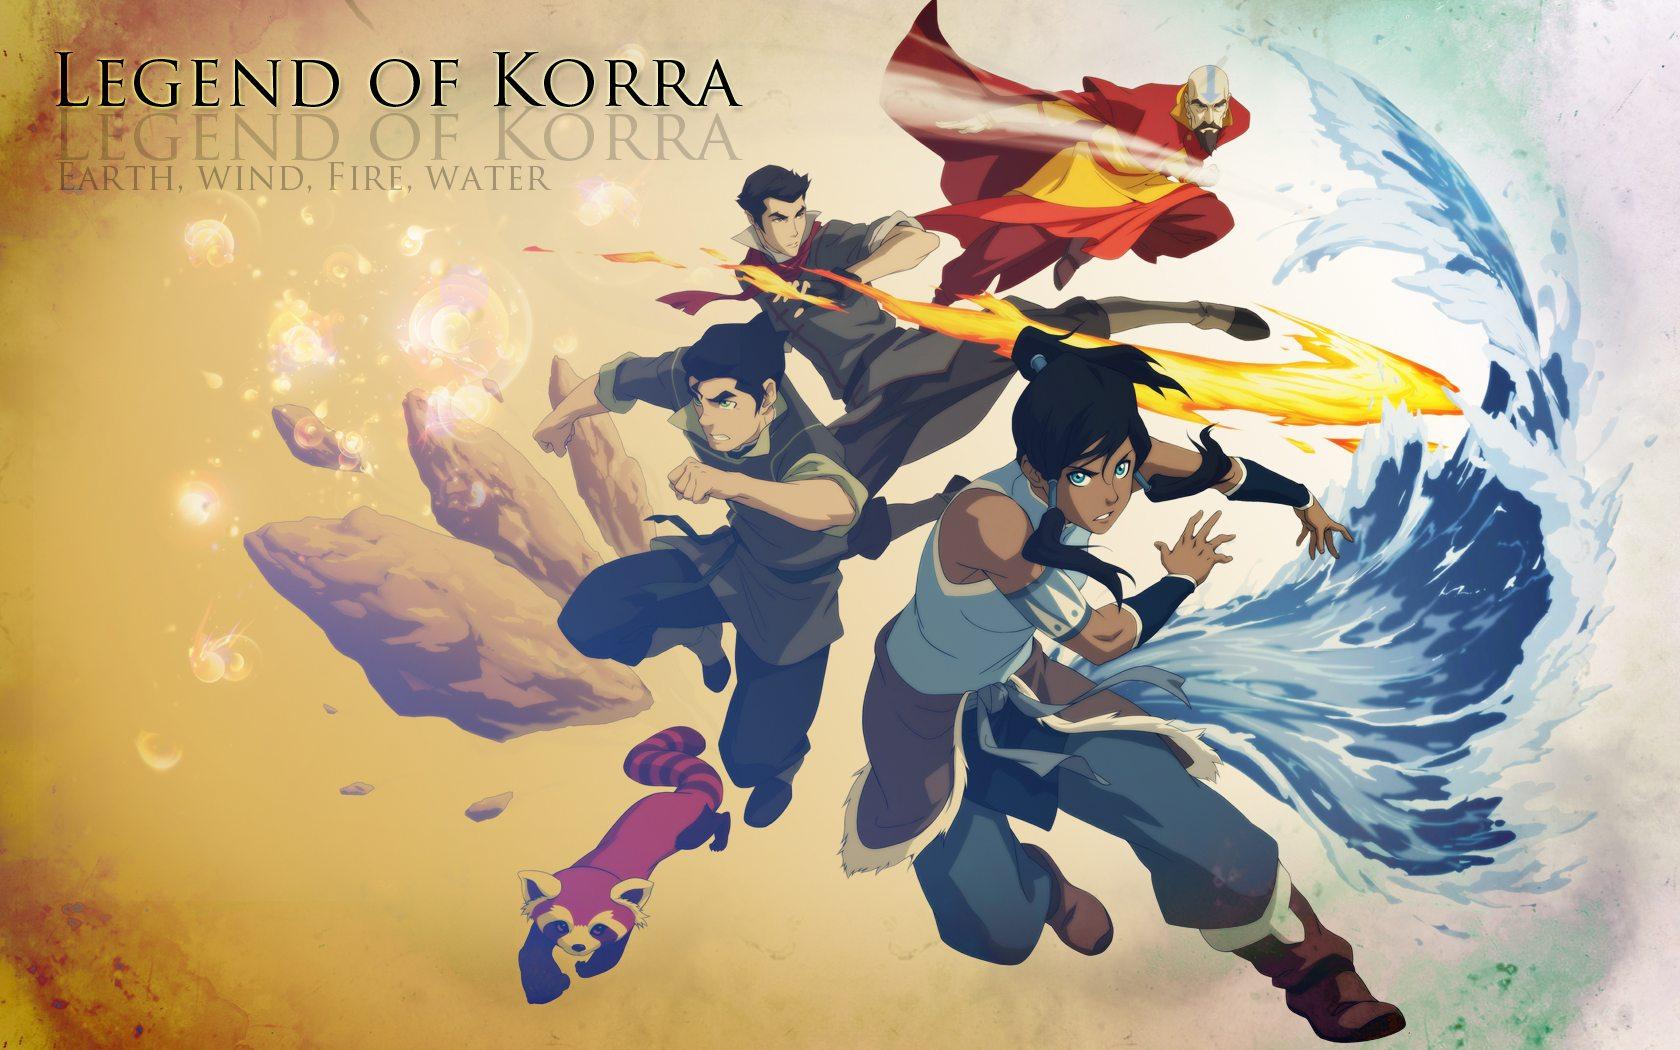 Avatar: The Legend of Korra on Nickelodeon.